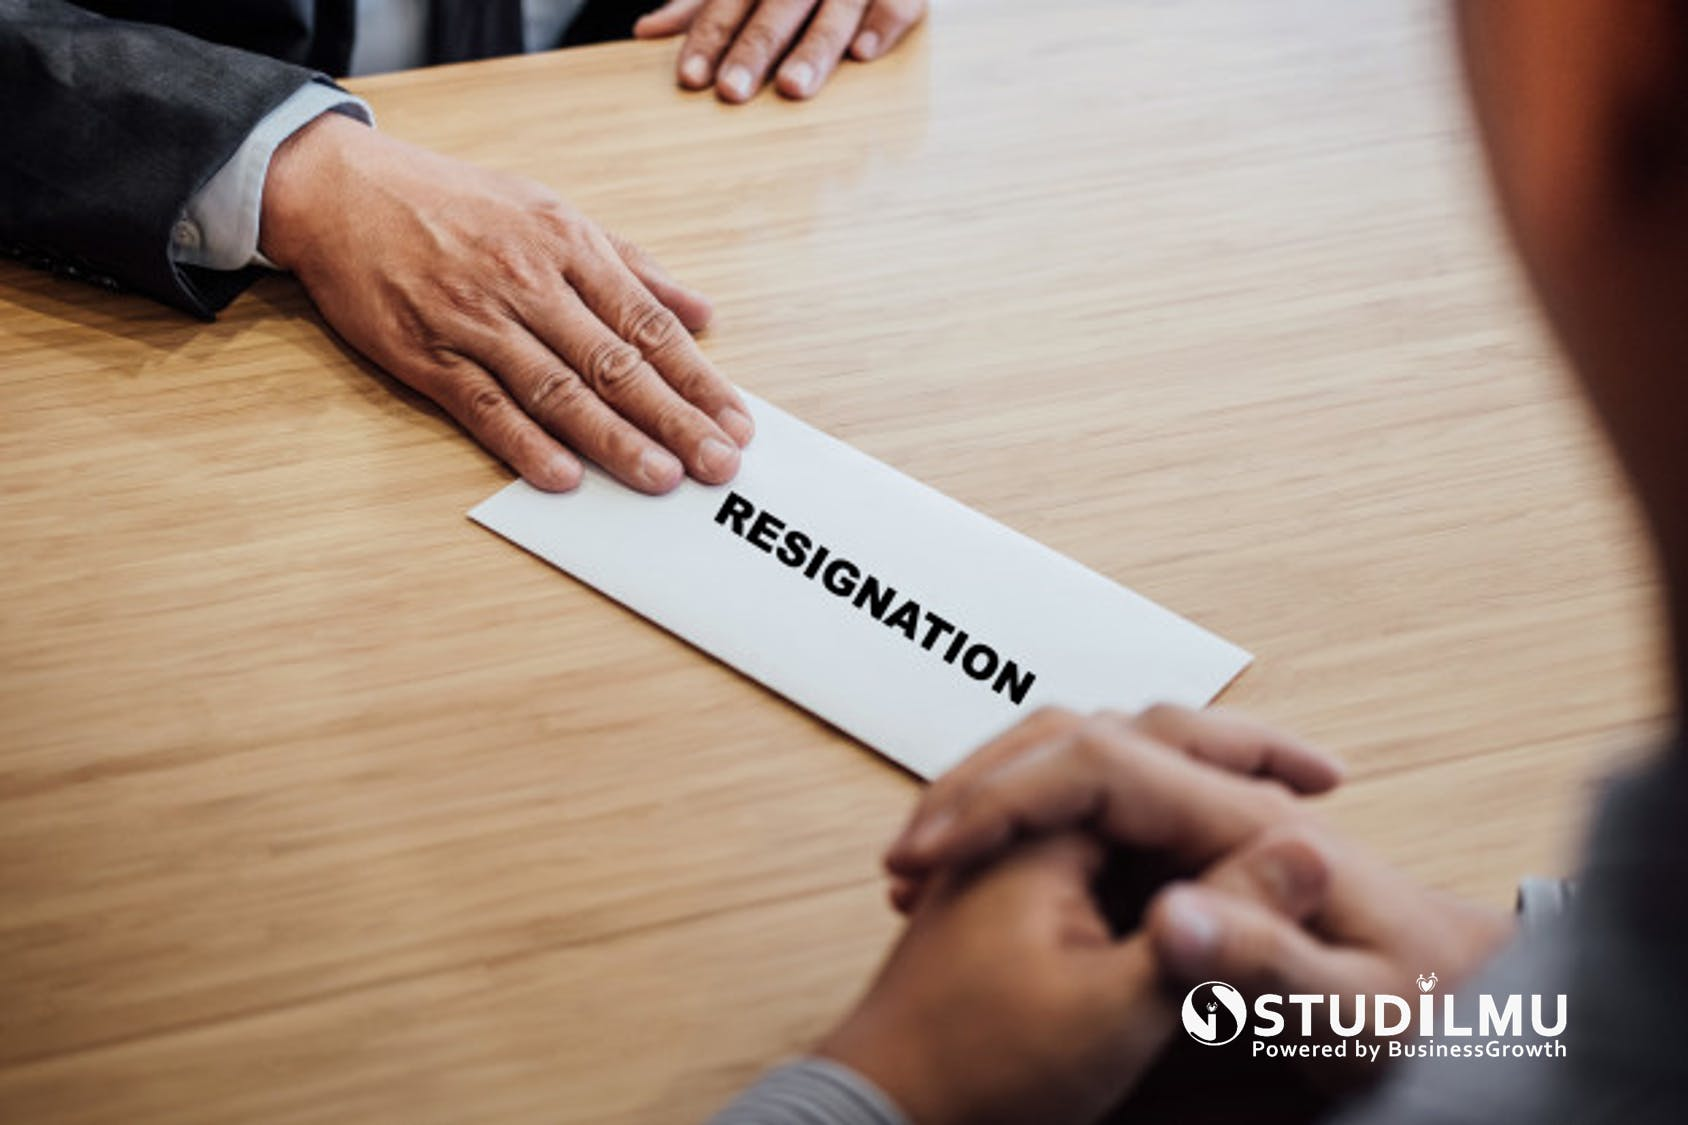 STUDILMU Career Advice - 2 Hal Penting Sebelum Mengundurkan Diri